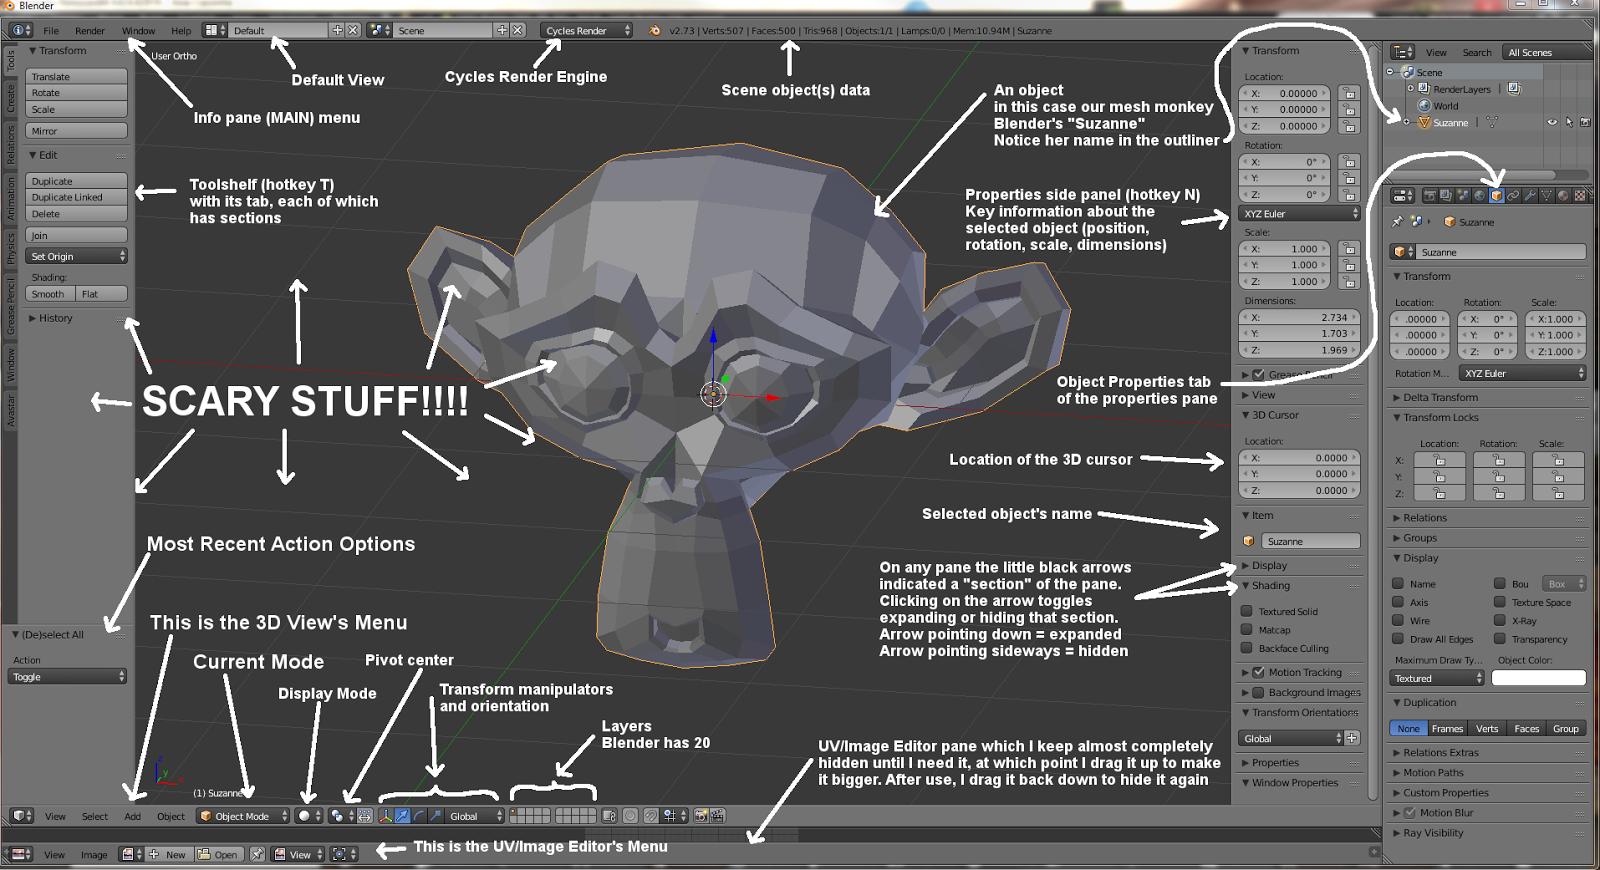 Blender tutorial series released for OpenSim – Hypergrid